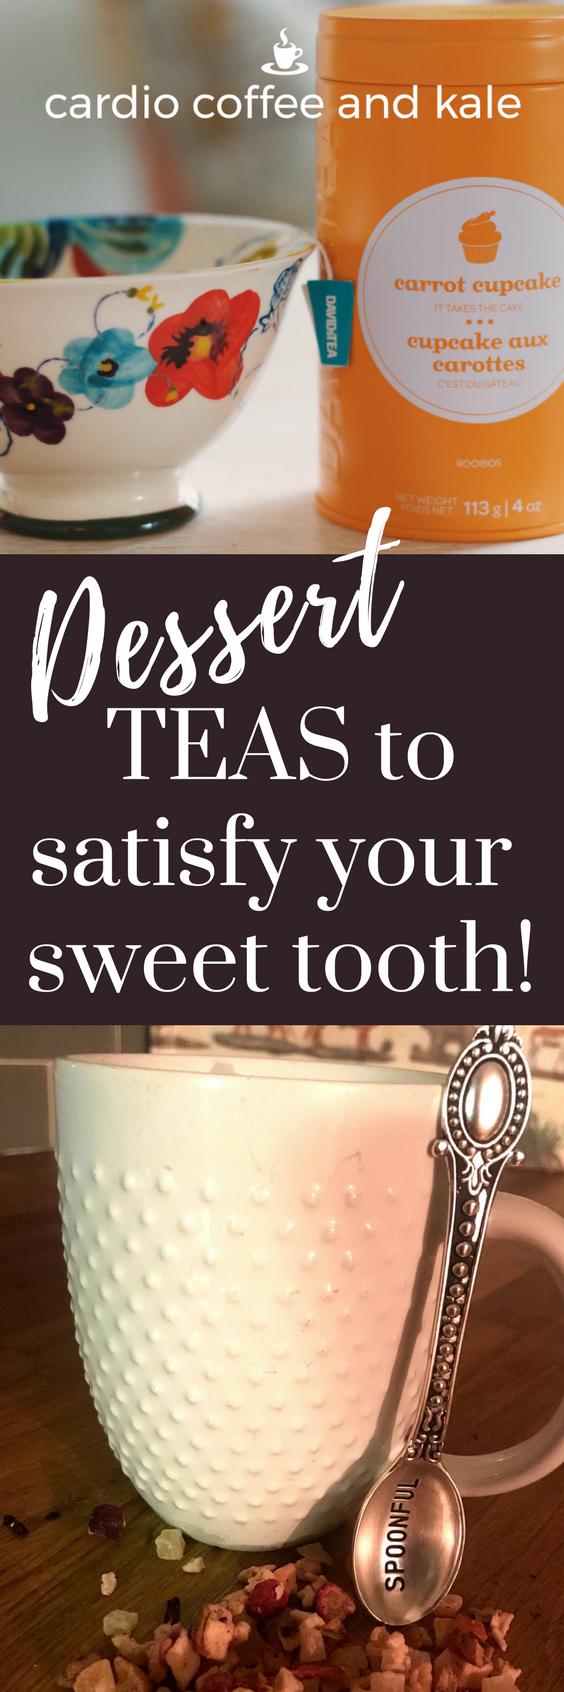 dessert teas long image.png www.cardiocoffeeandkale.com